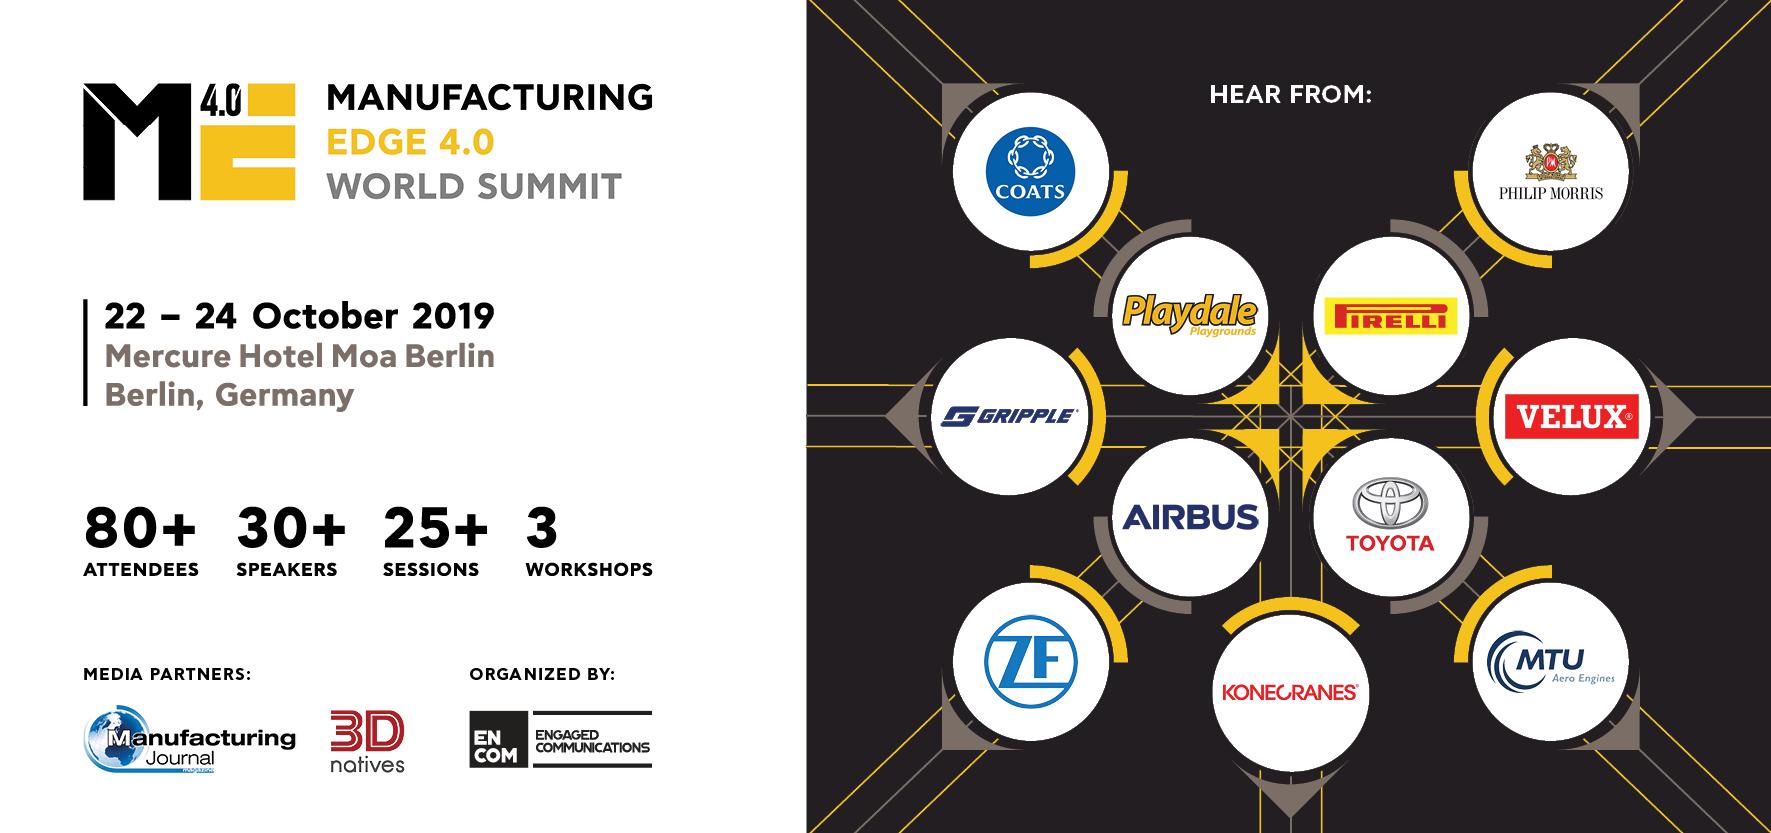 Manufacturing Edge 4.0 World Summit